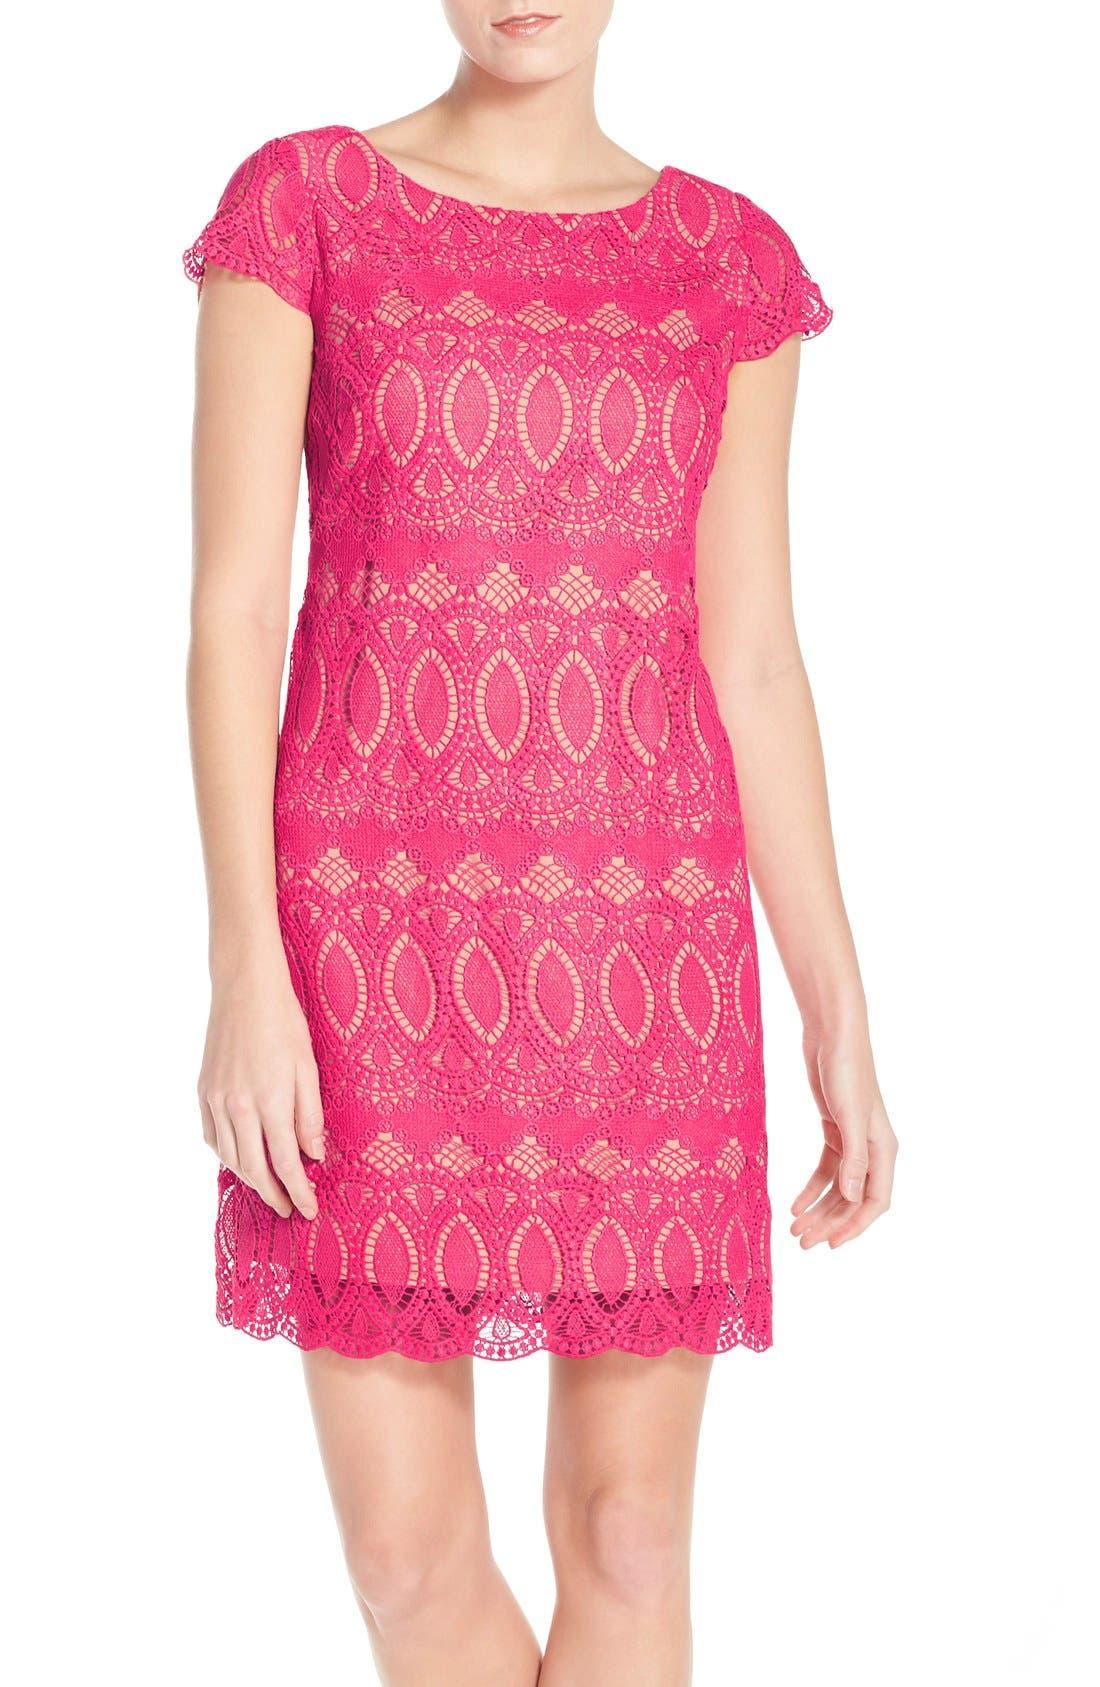 Scalloped Lace Sheath Dress,                         Main,                         color, 660